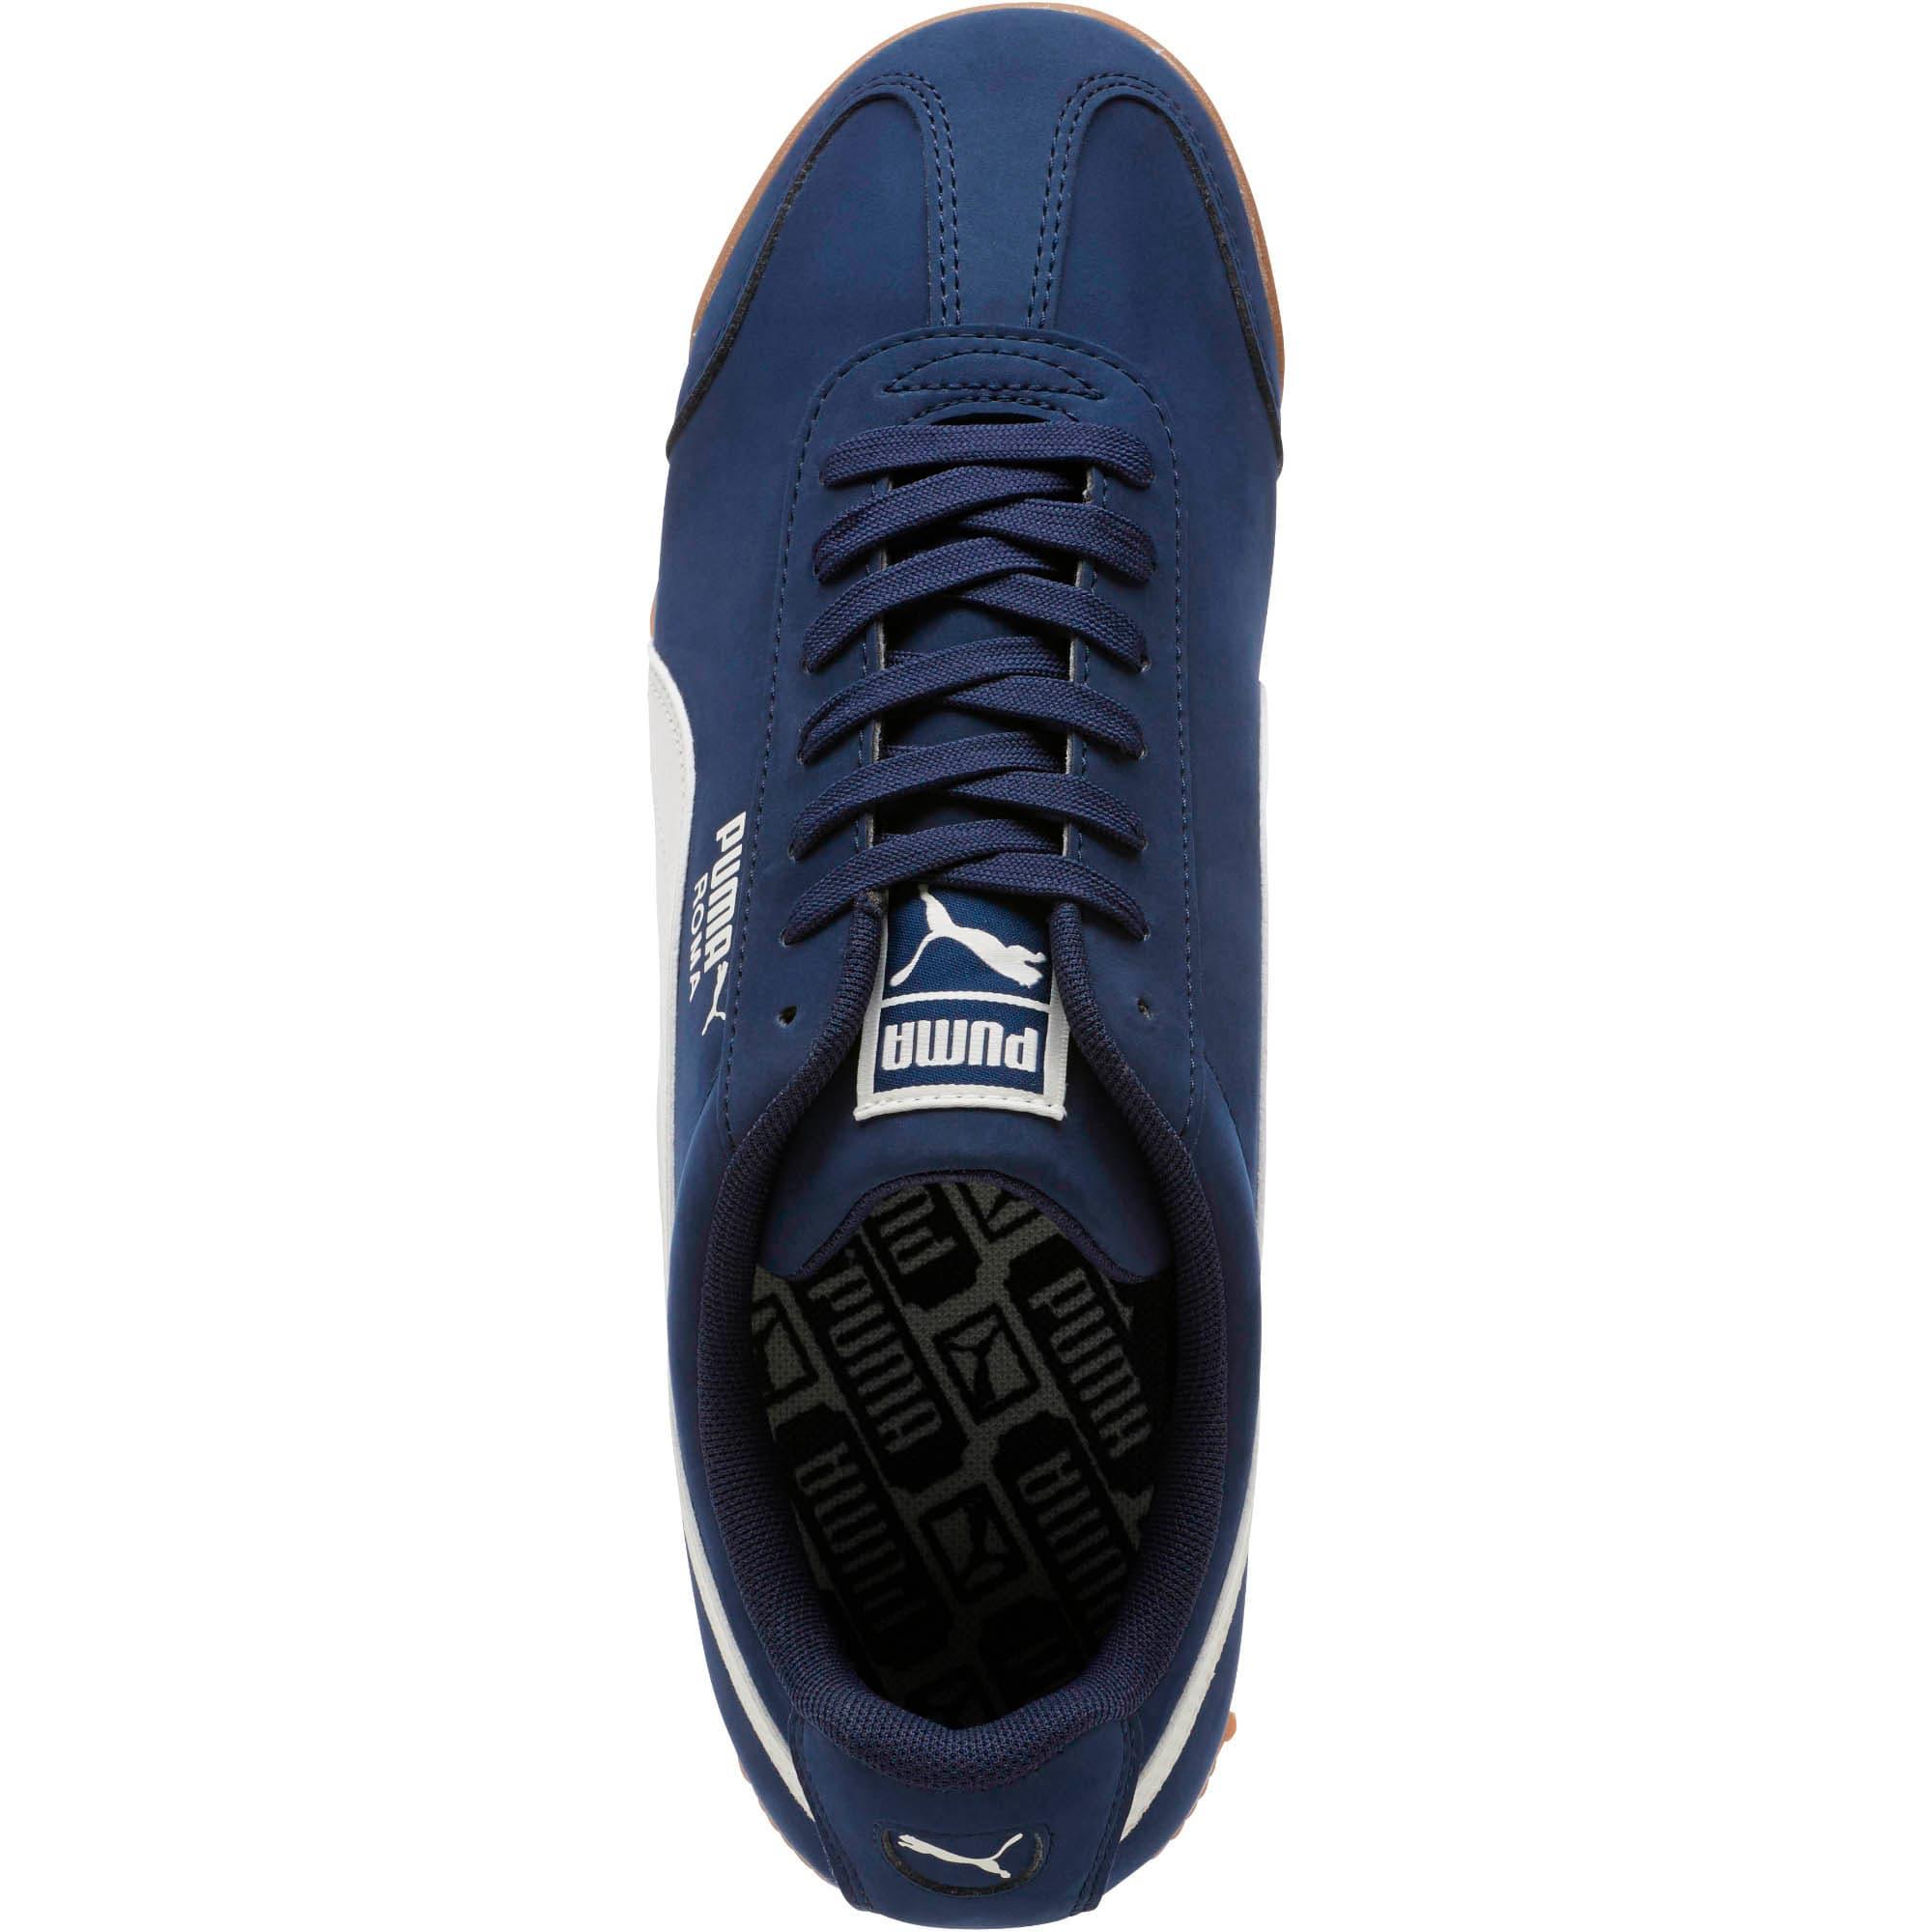 Thumbnail 5 of Roma Smooth Nubuck Sneakers, Peacoat-Whisper White, medium